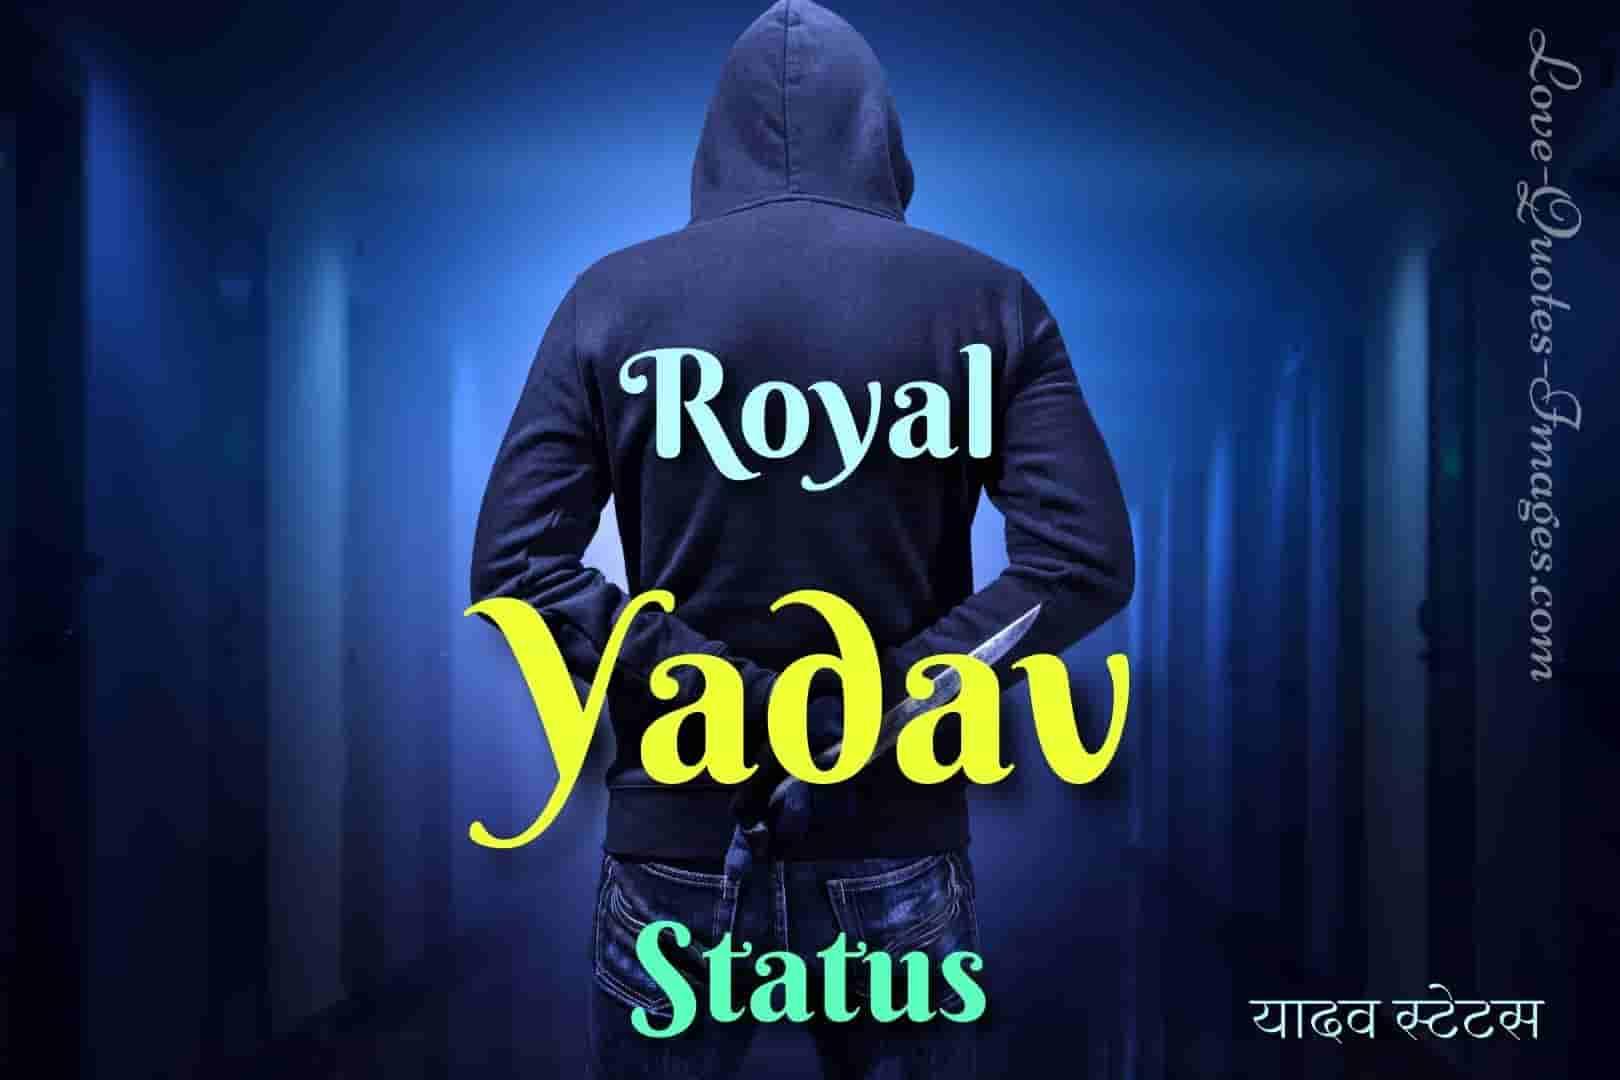 Royal Yadav Status